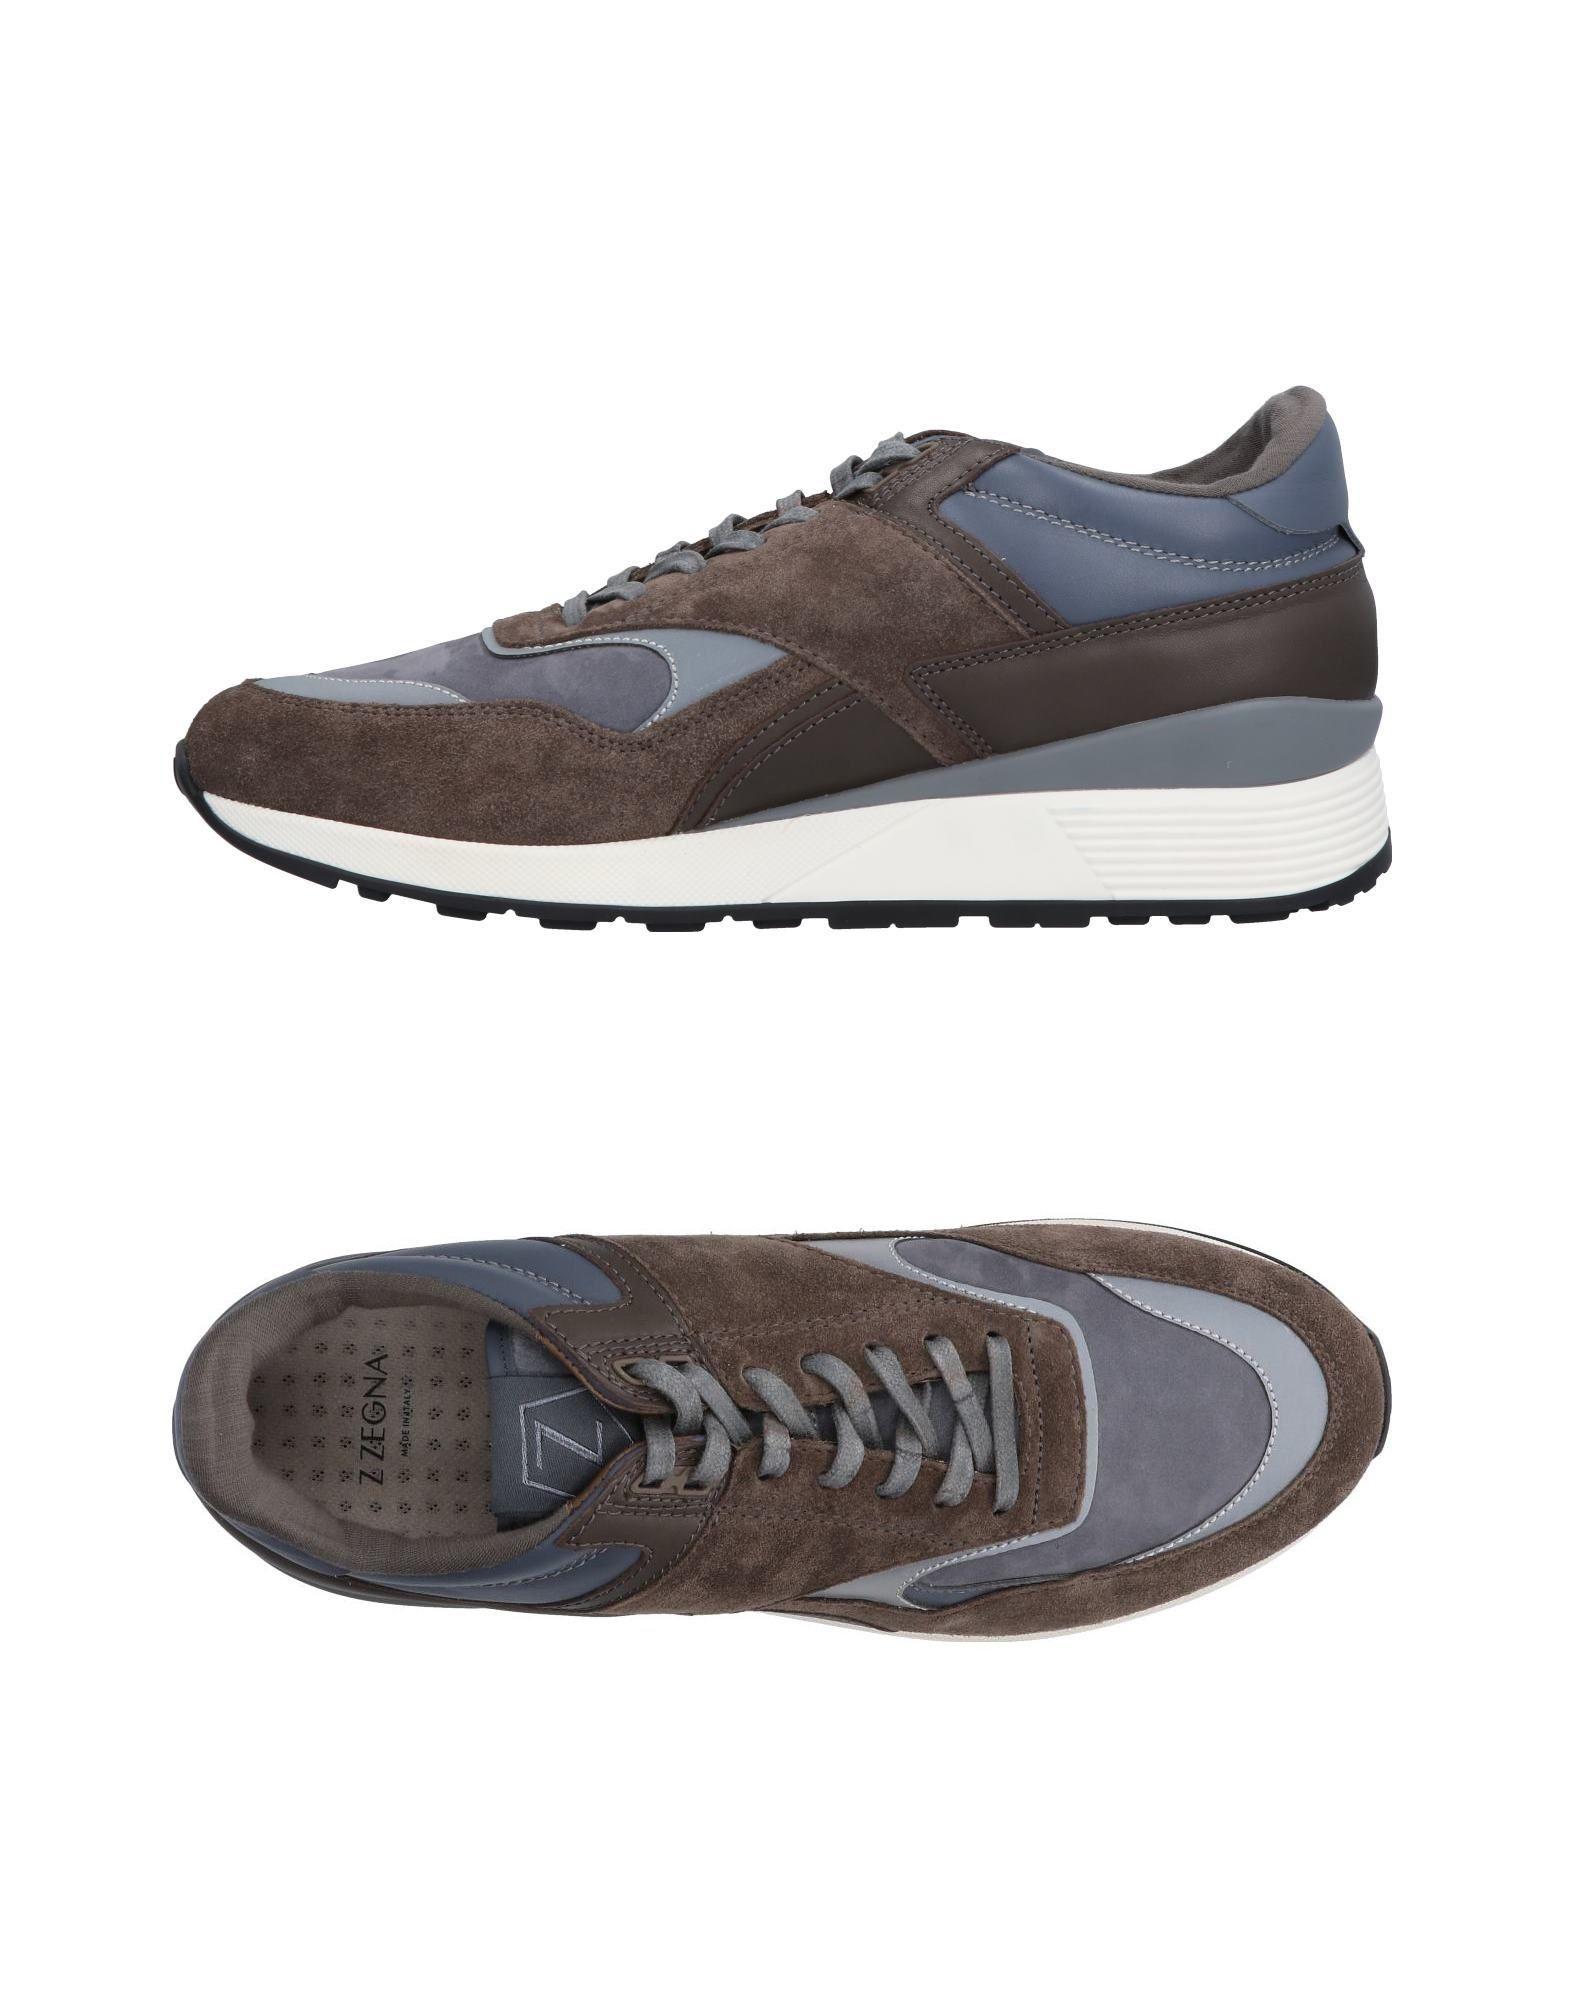 Moda Sneakers Zzegna Uomo - 11486951QH